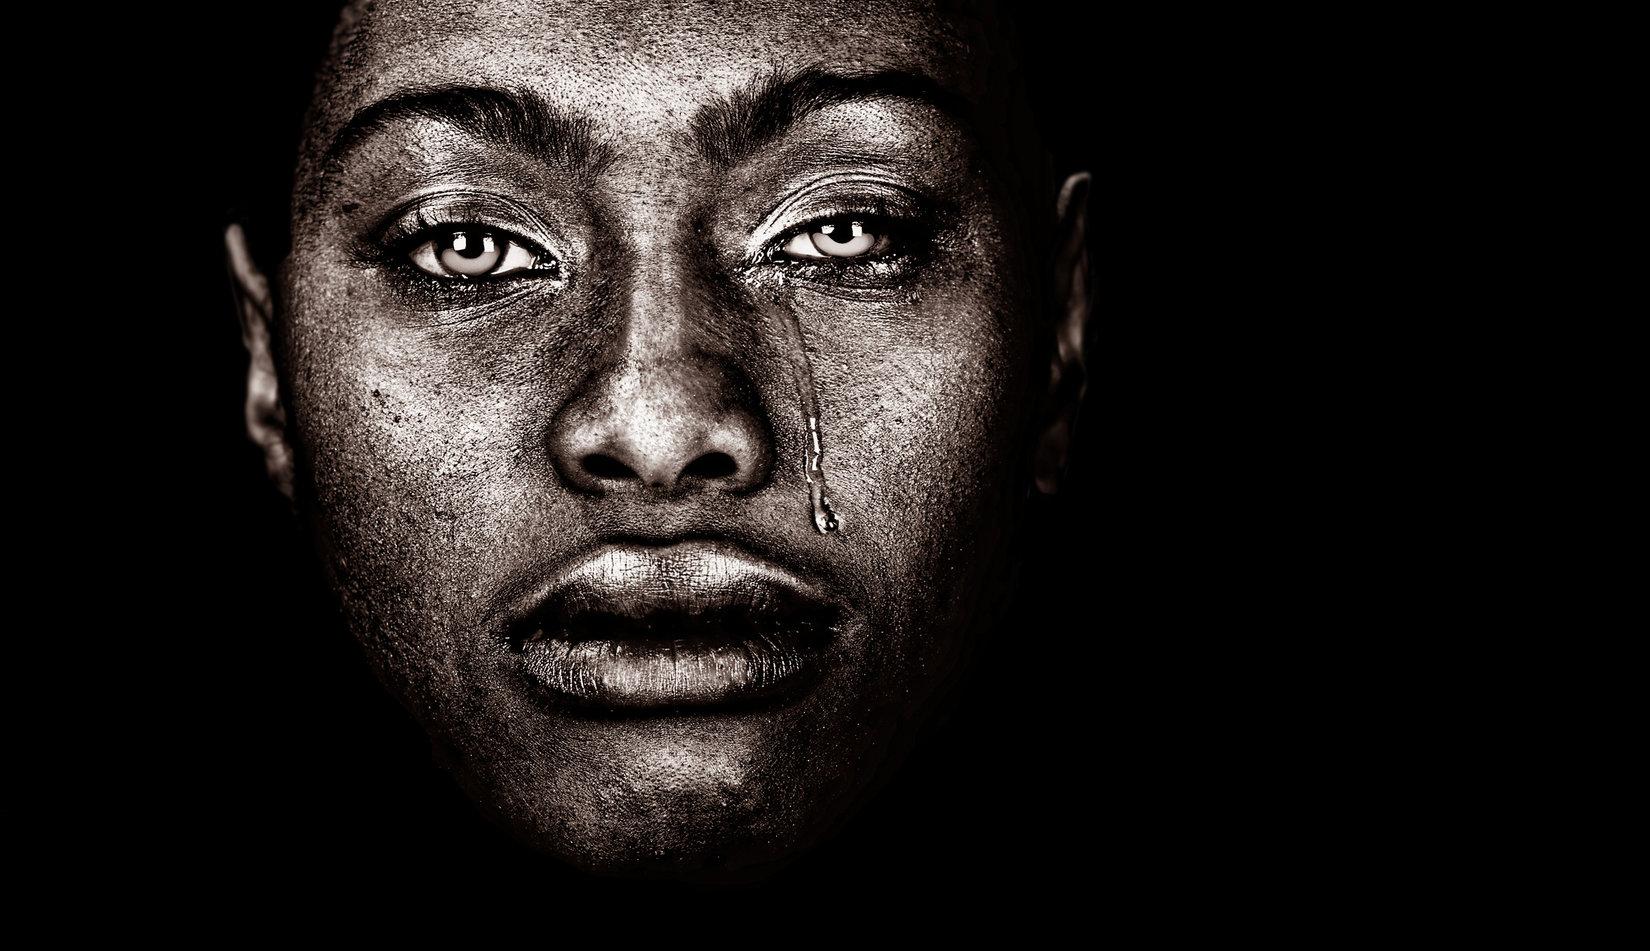 America black women sex slavery pic 268